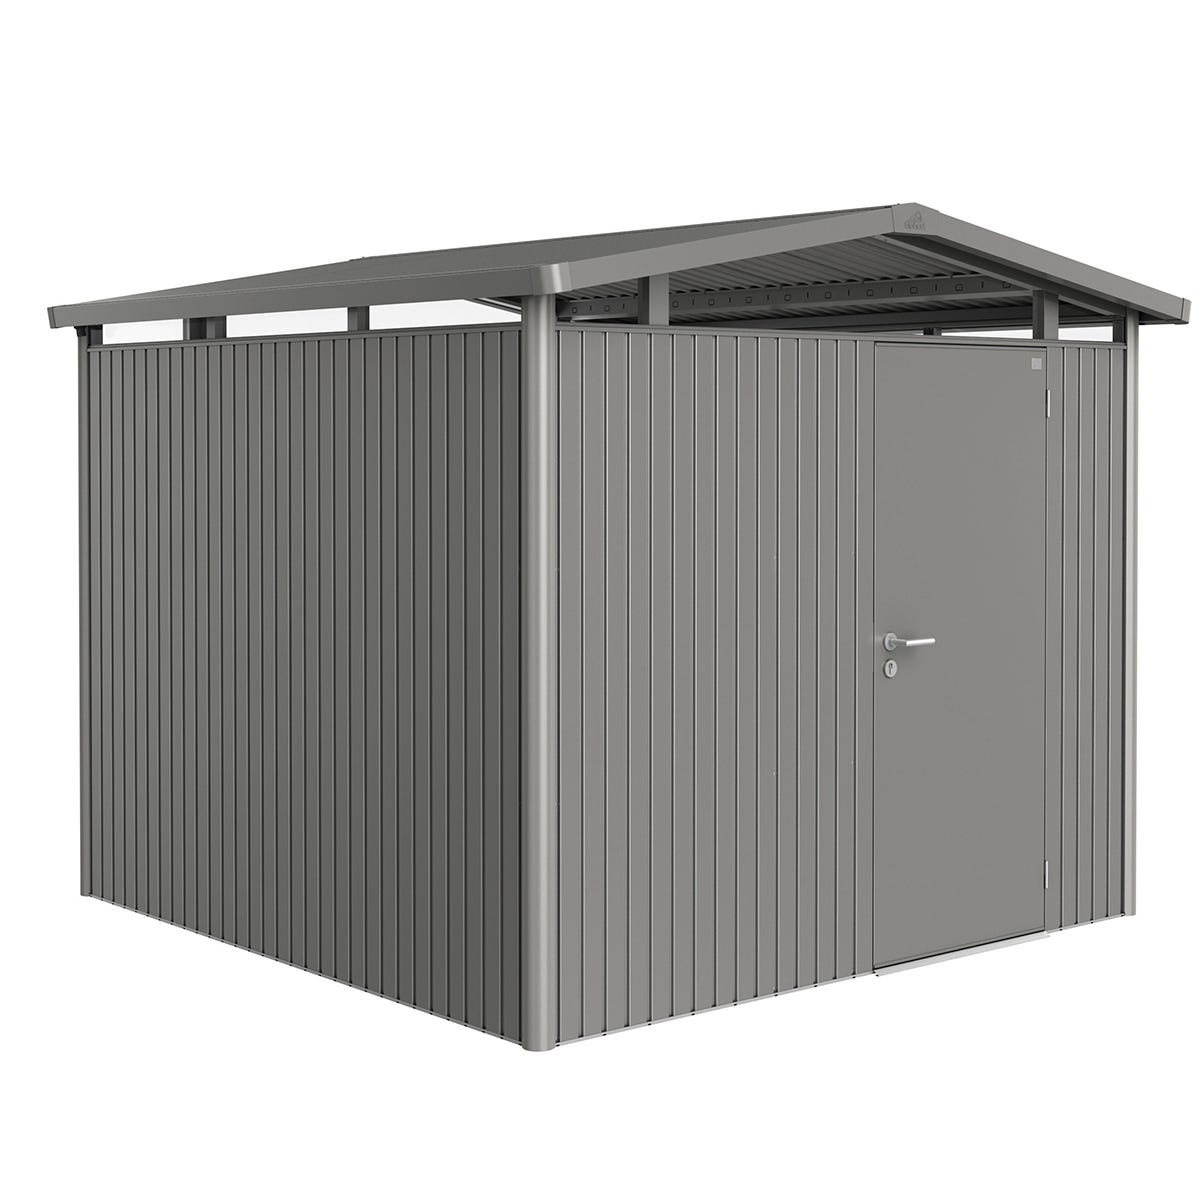 Biohort Panorama Metal Shed P4 Standard Door 9' x 9' 1'' - Quartz Grey